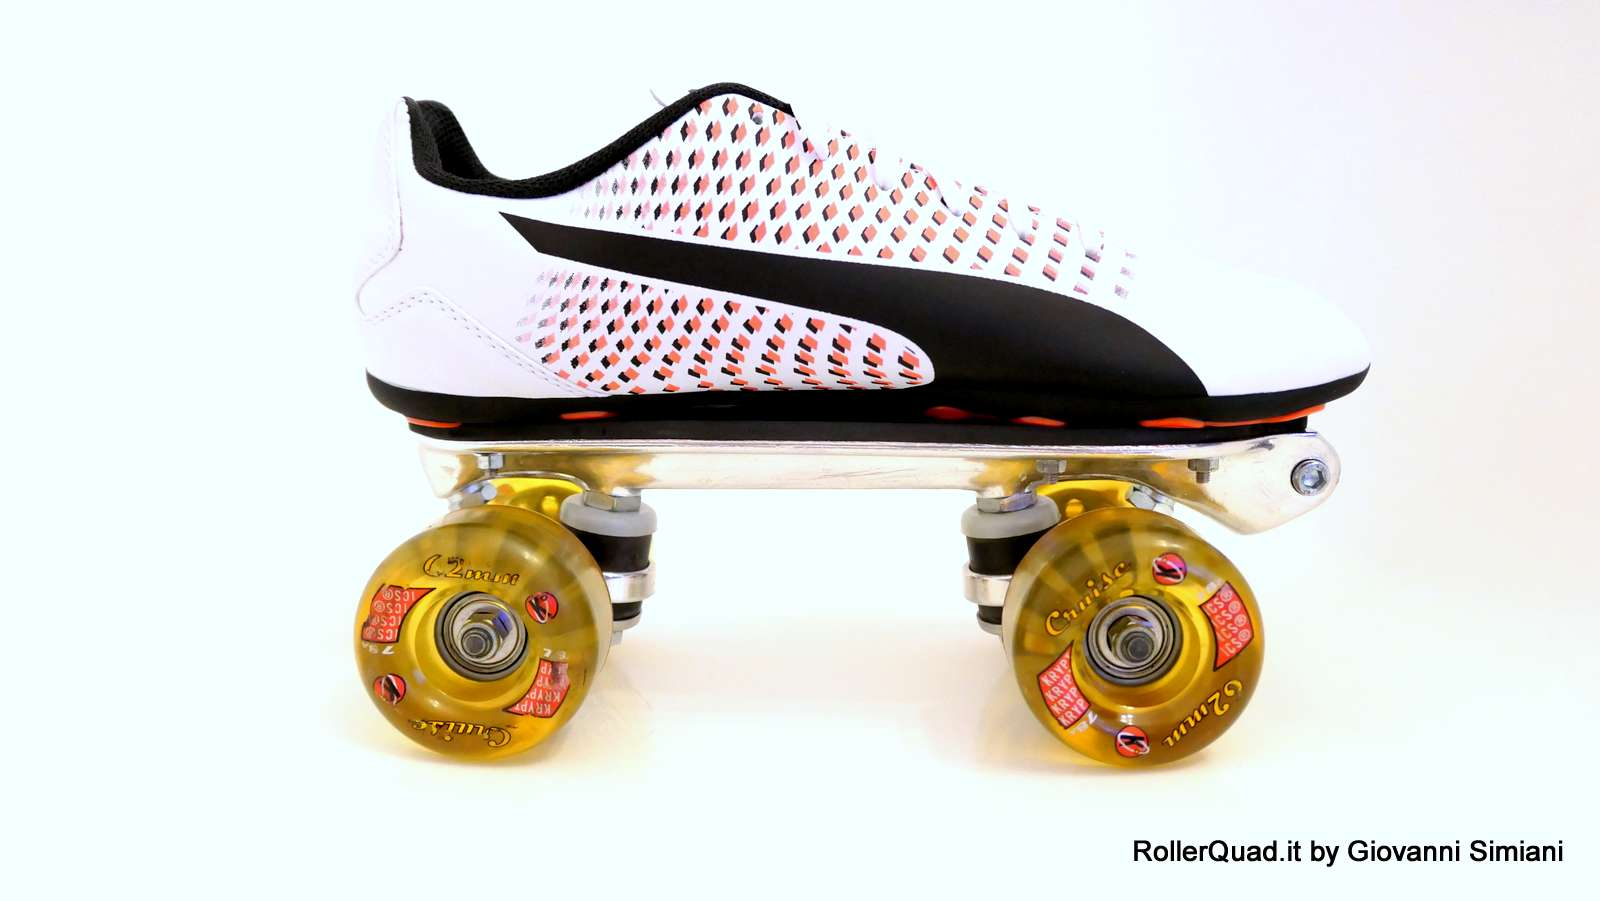 05-rollerquad_it_Giovanni_Simiani